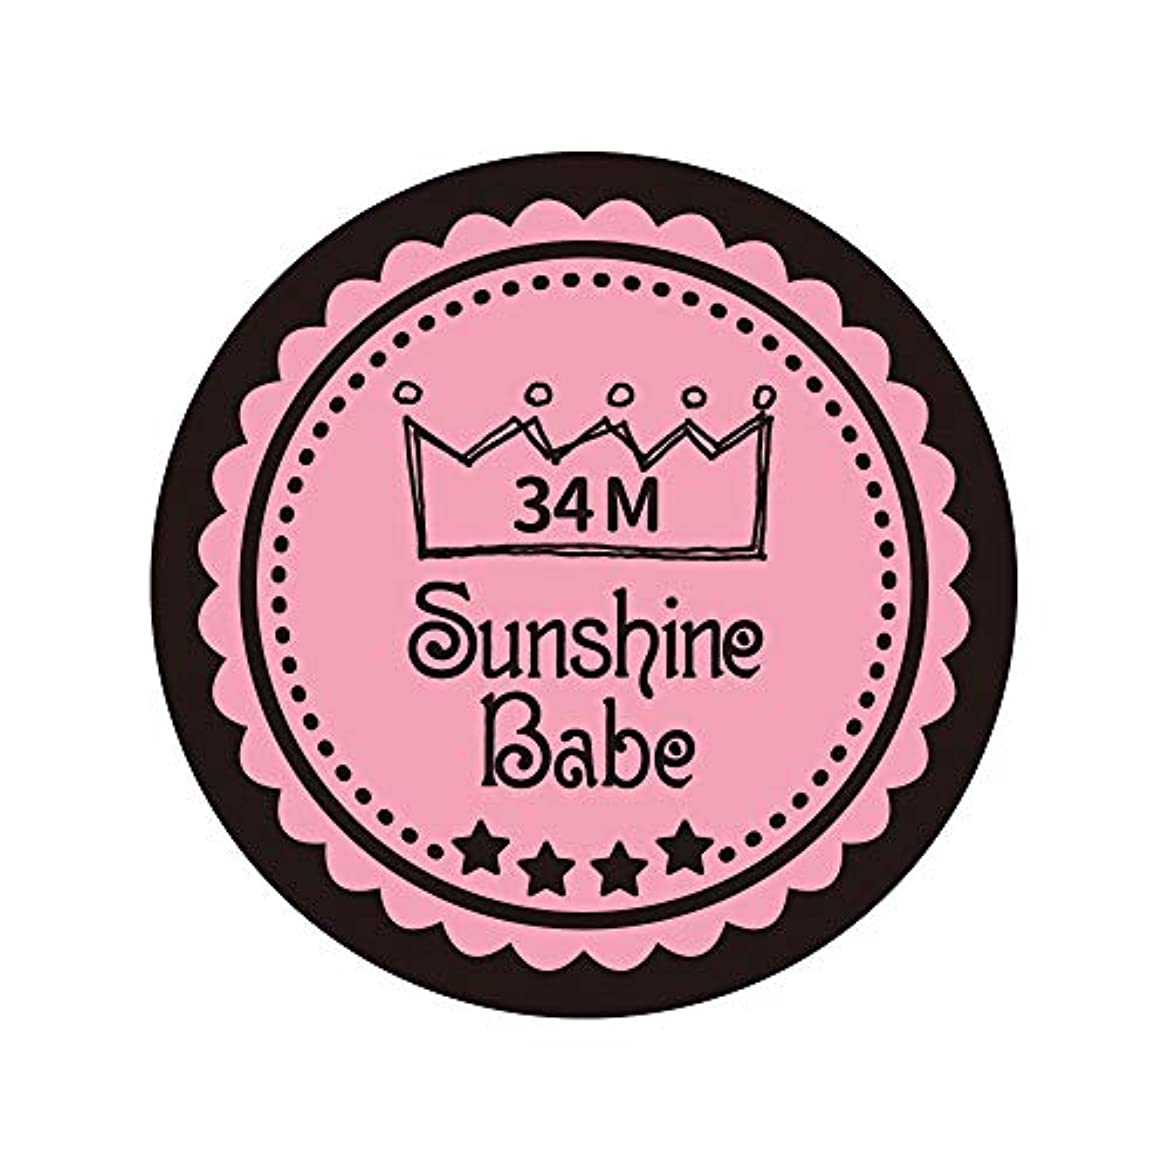 Sunshine Babe カラージェル 34M メロウローズ 4g UV/LED対応